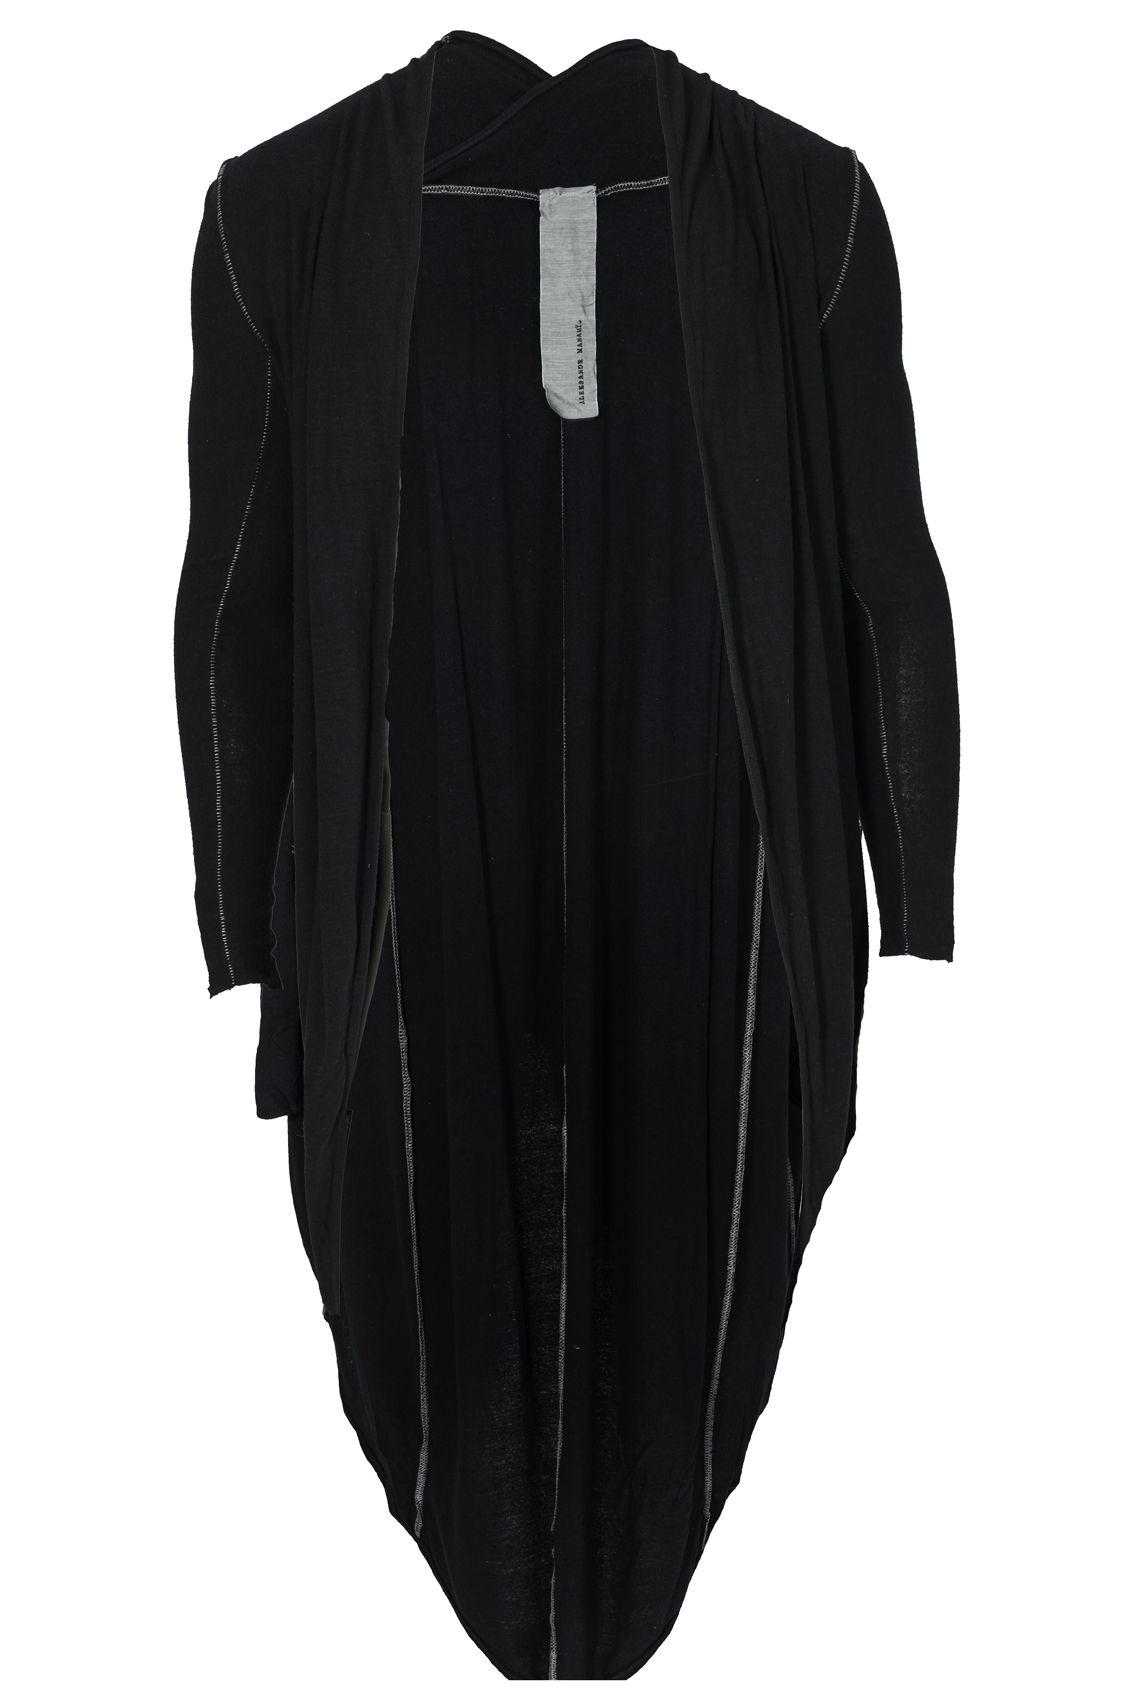 ALEKSANDR MANAMIS | Cocoon raw silk cardigan